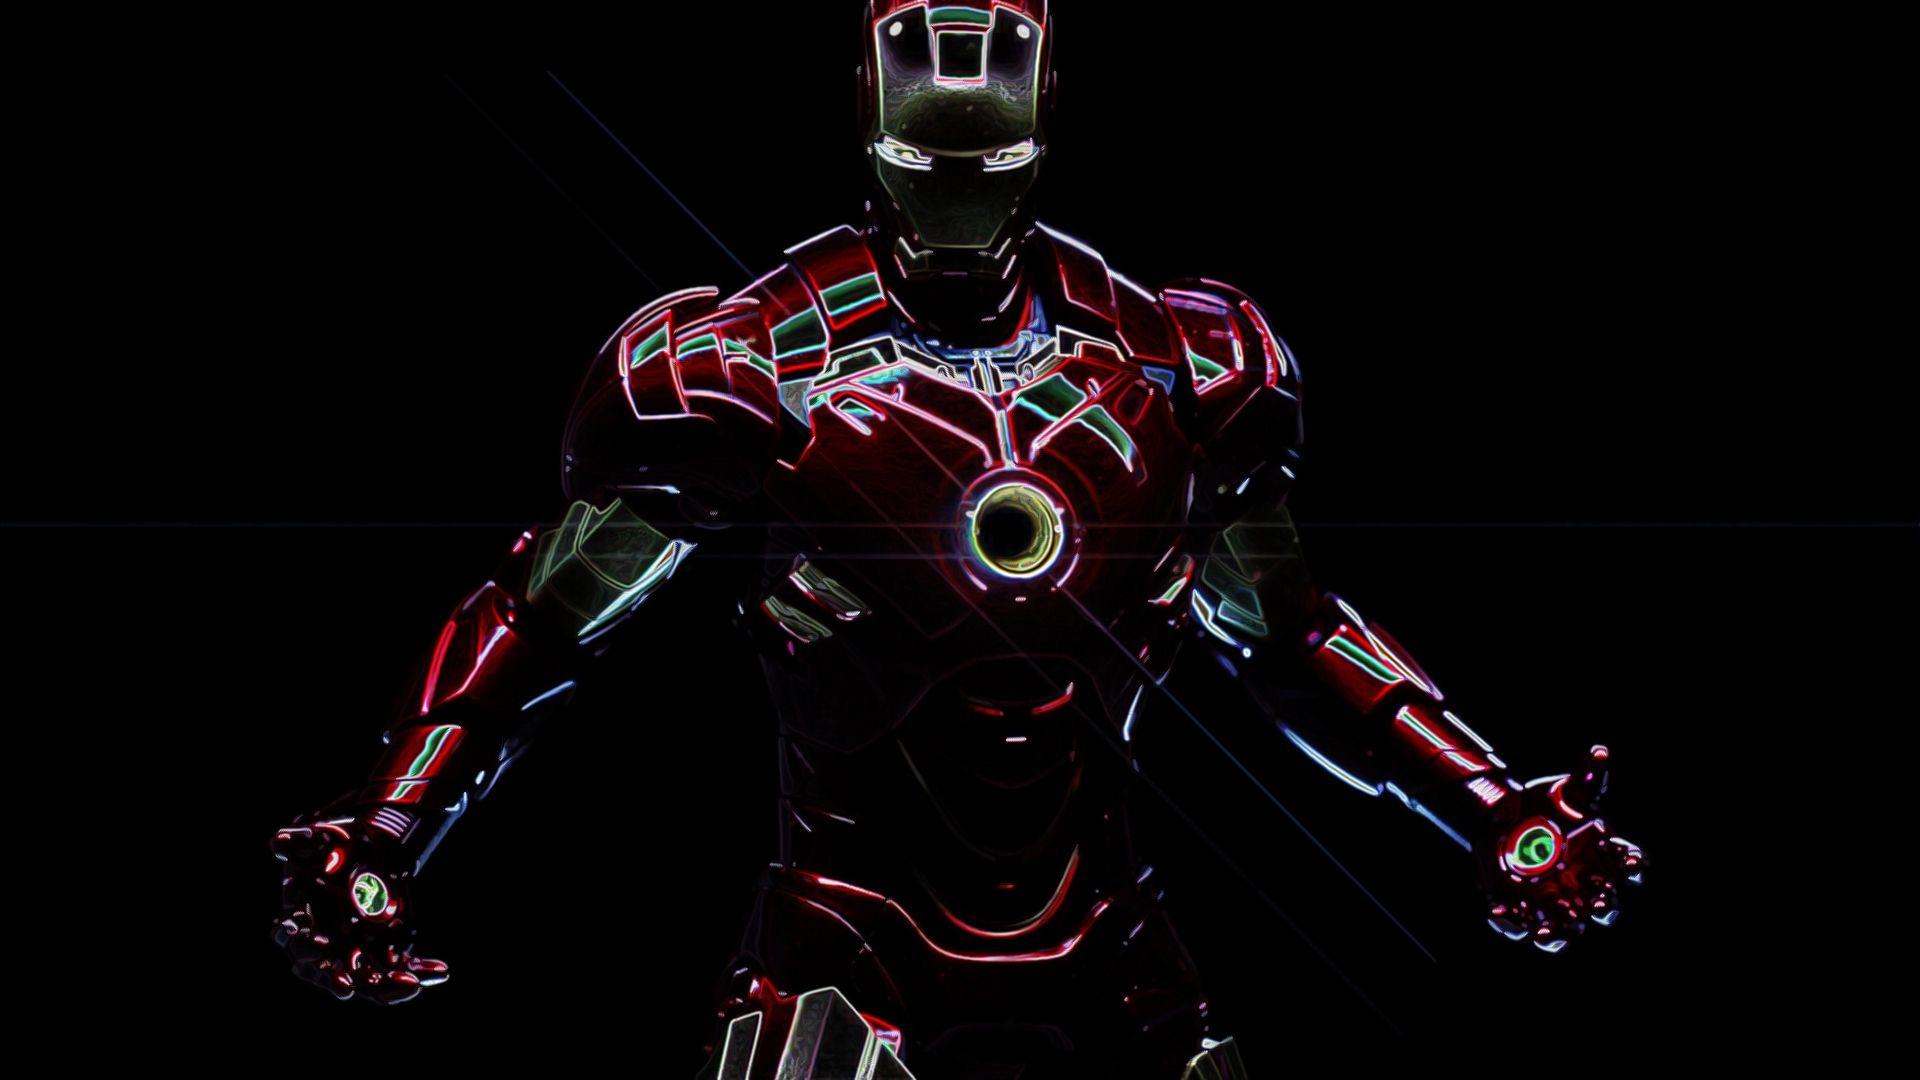 All Iron Man Suit Wallpaper Phone i1f Pc 배경화면, 아이언맨, 마블